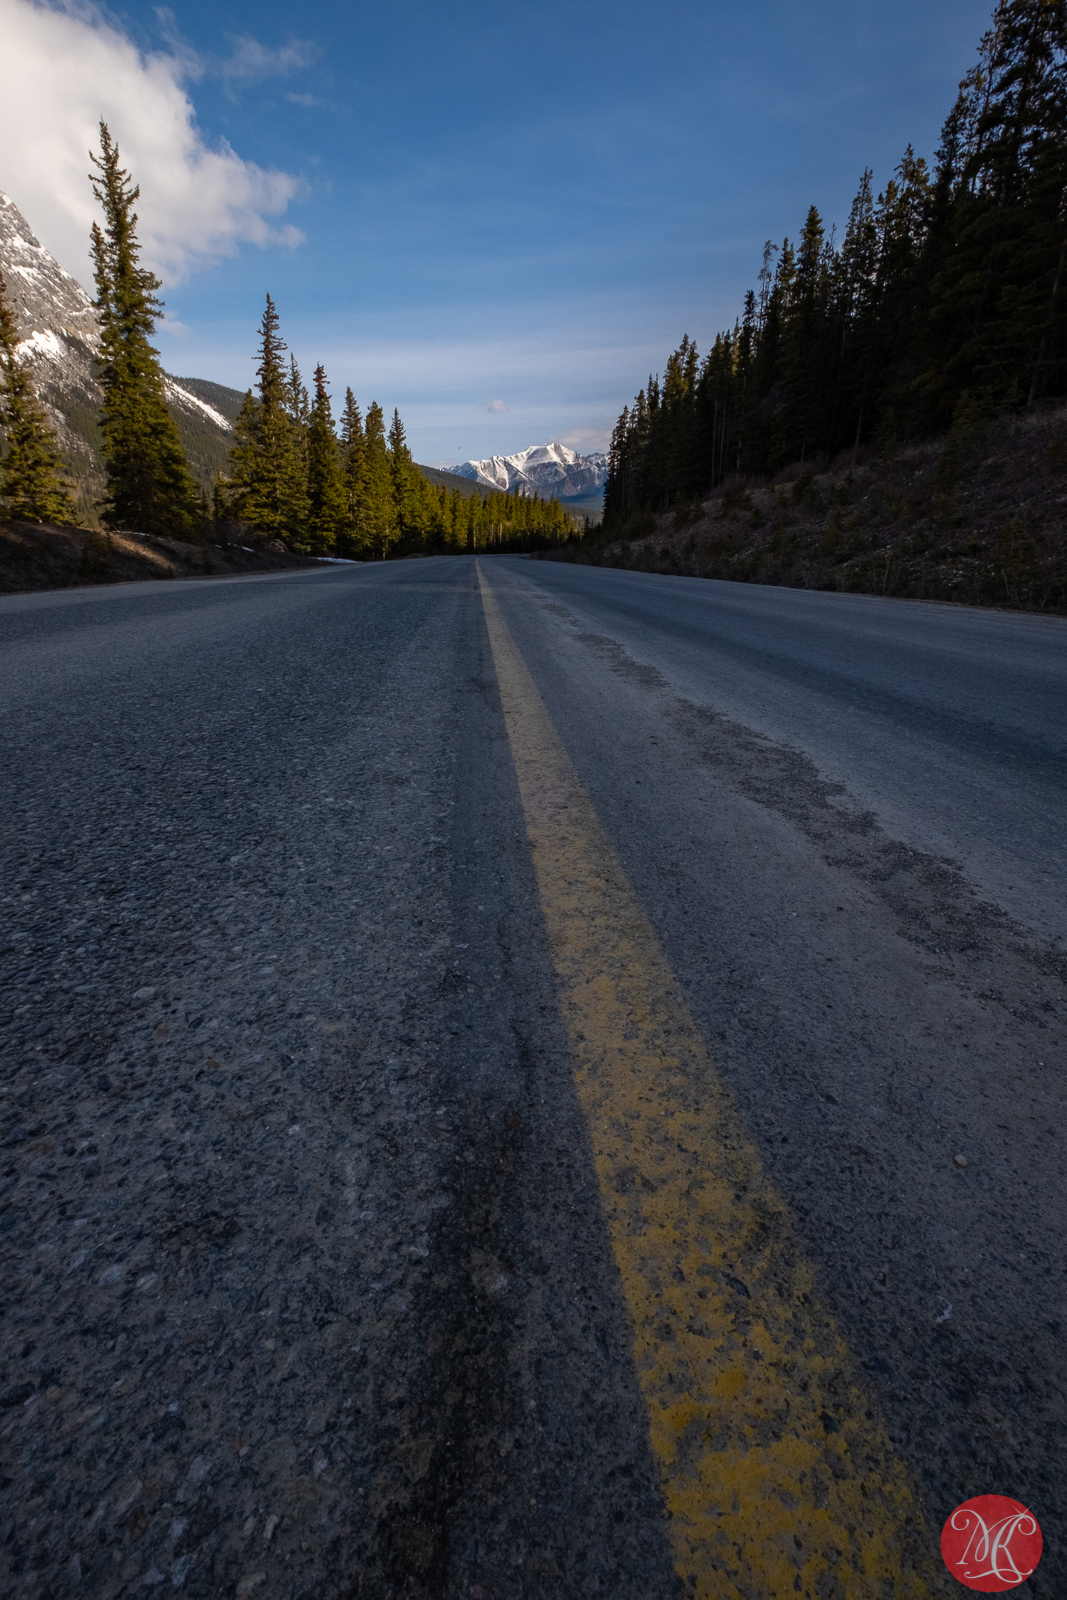 Roads to follow